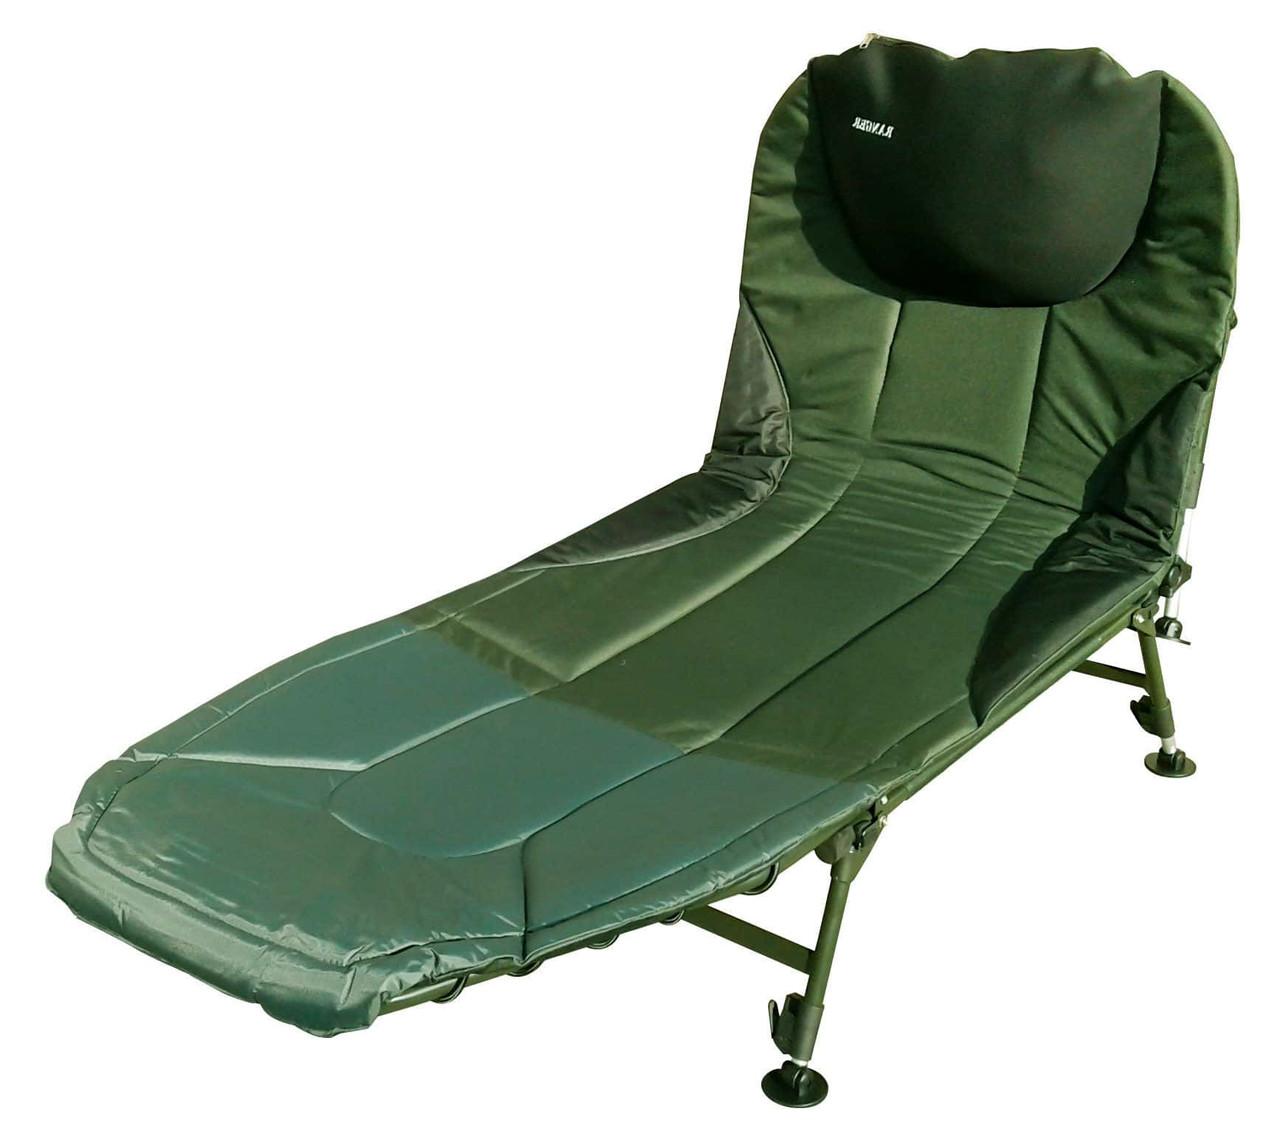 Карповая раскладушка кресло для рыбалки природы Ranger BED 82 до 160 кг нагрузки + чехол